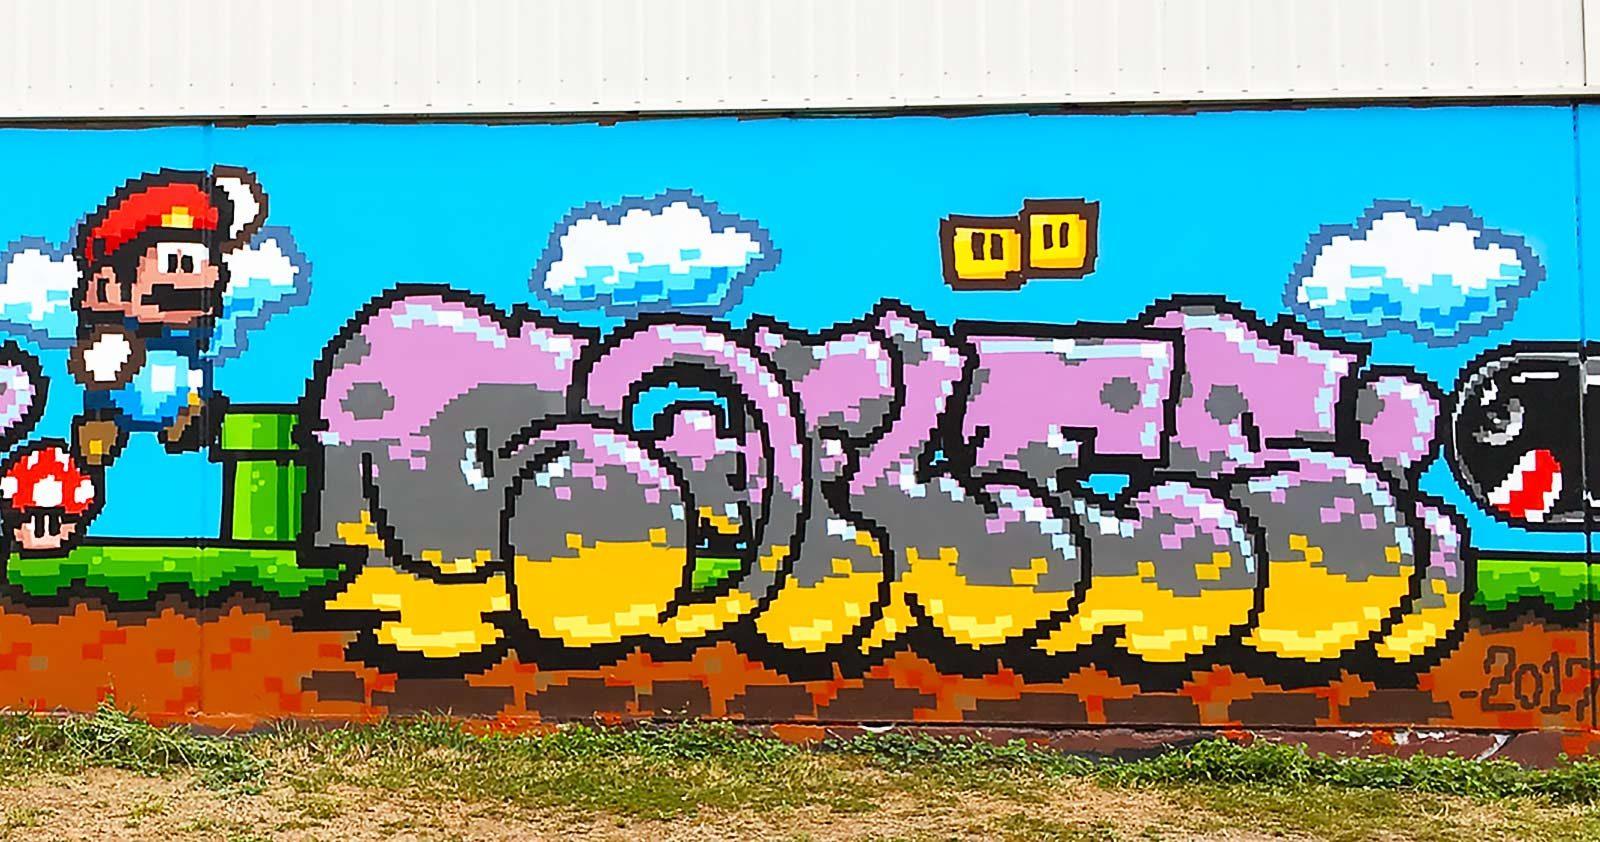 Retrogaming: Le Graffiti passe en mode 8-bits